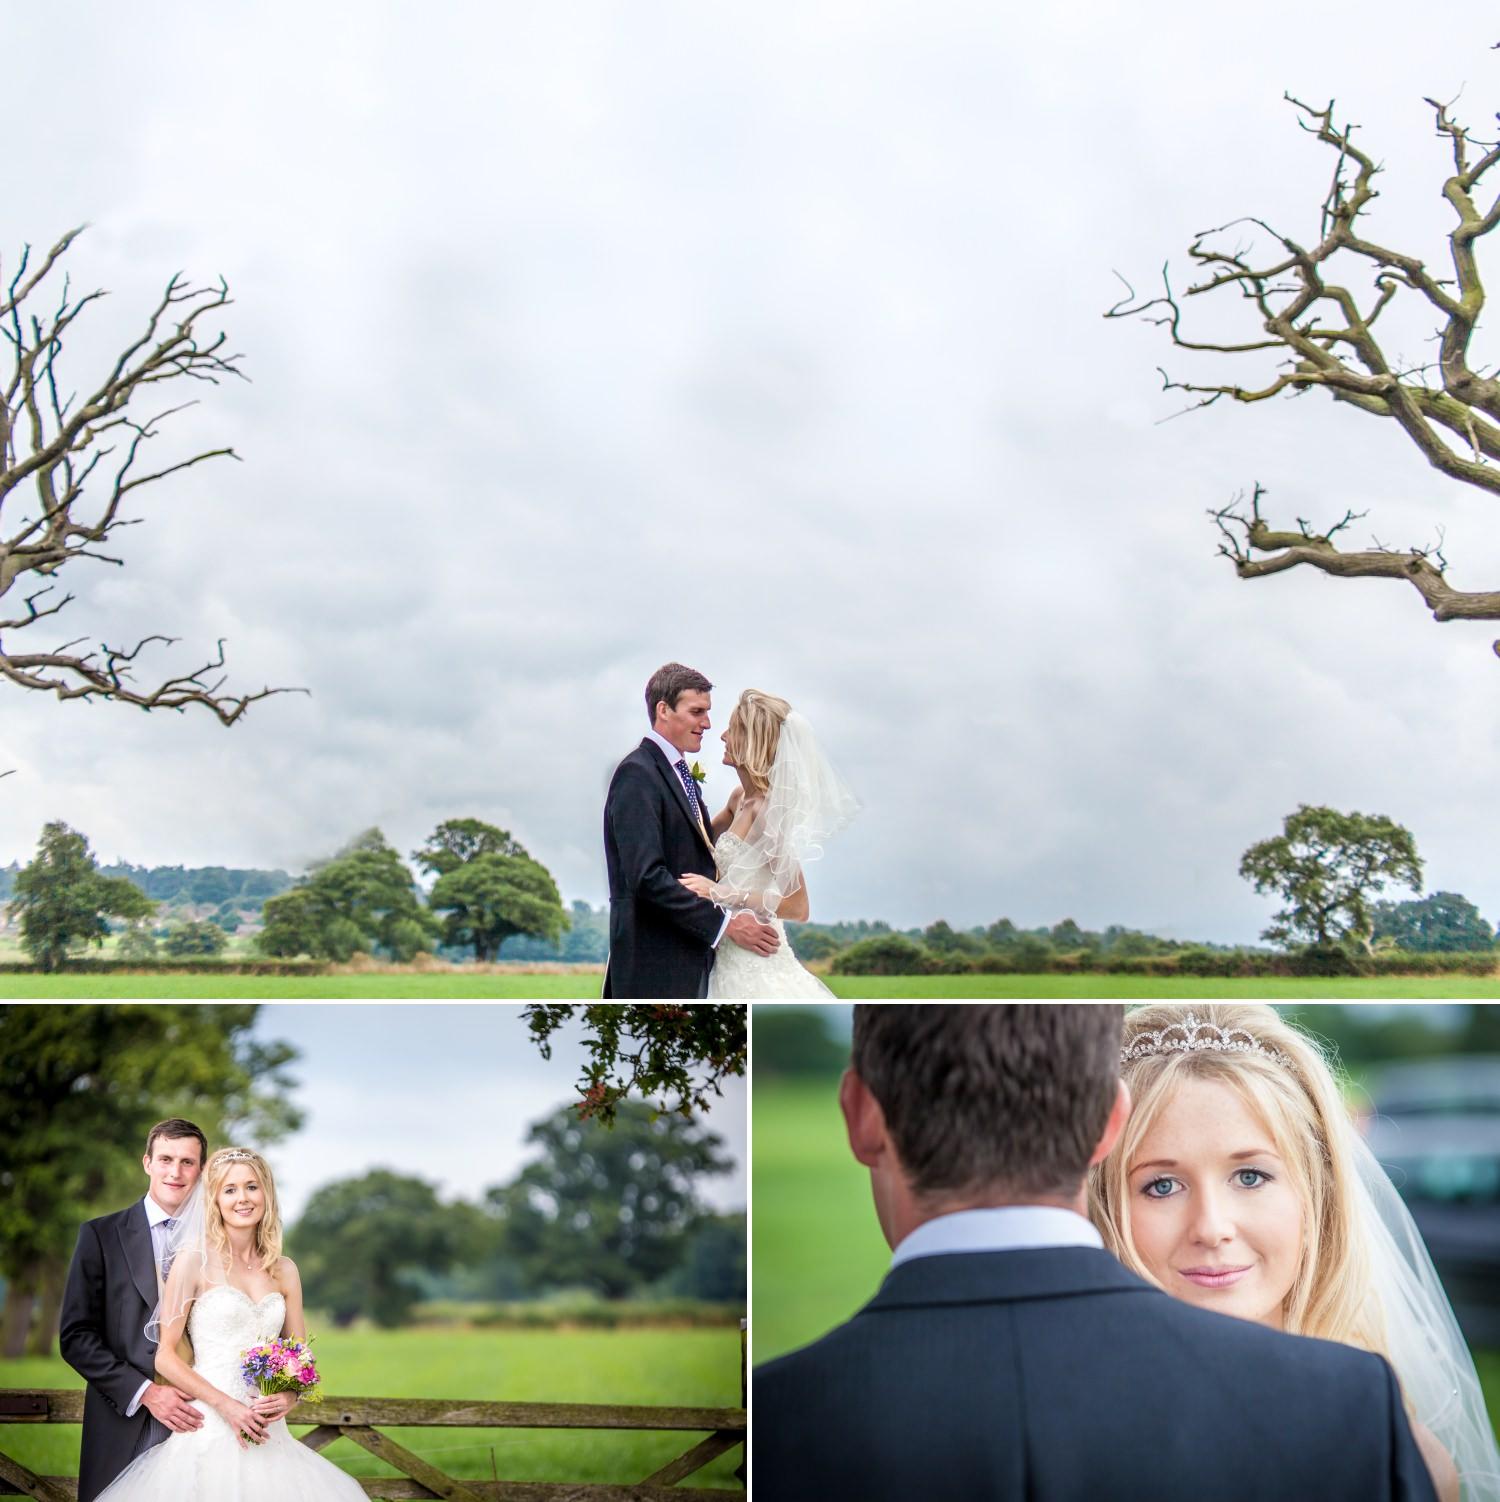 Wedding Photography portraits in Cheshire farm wedding